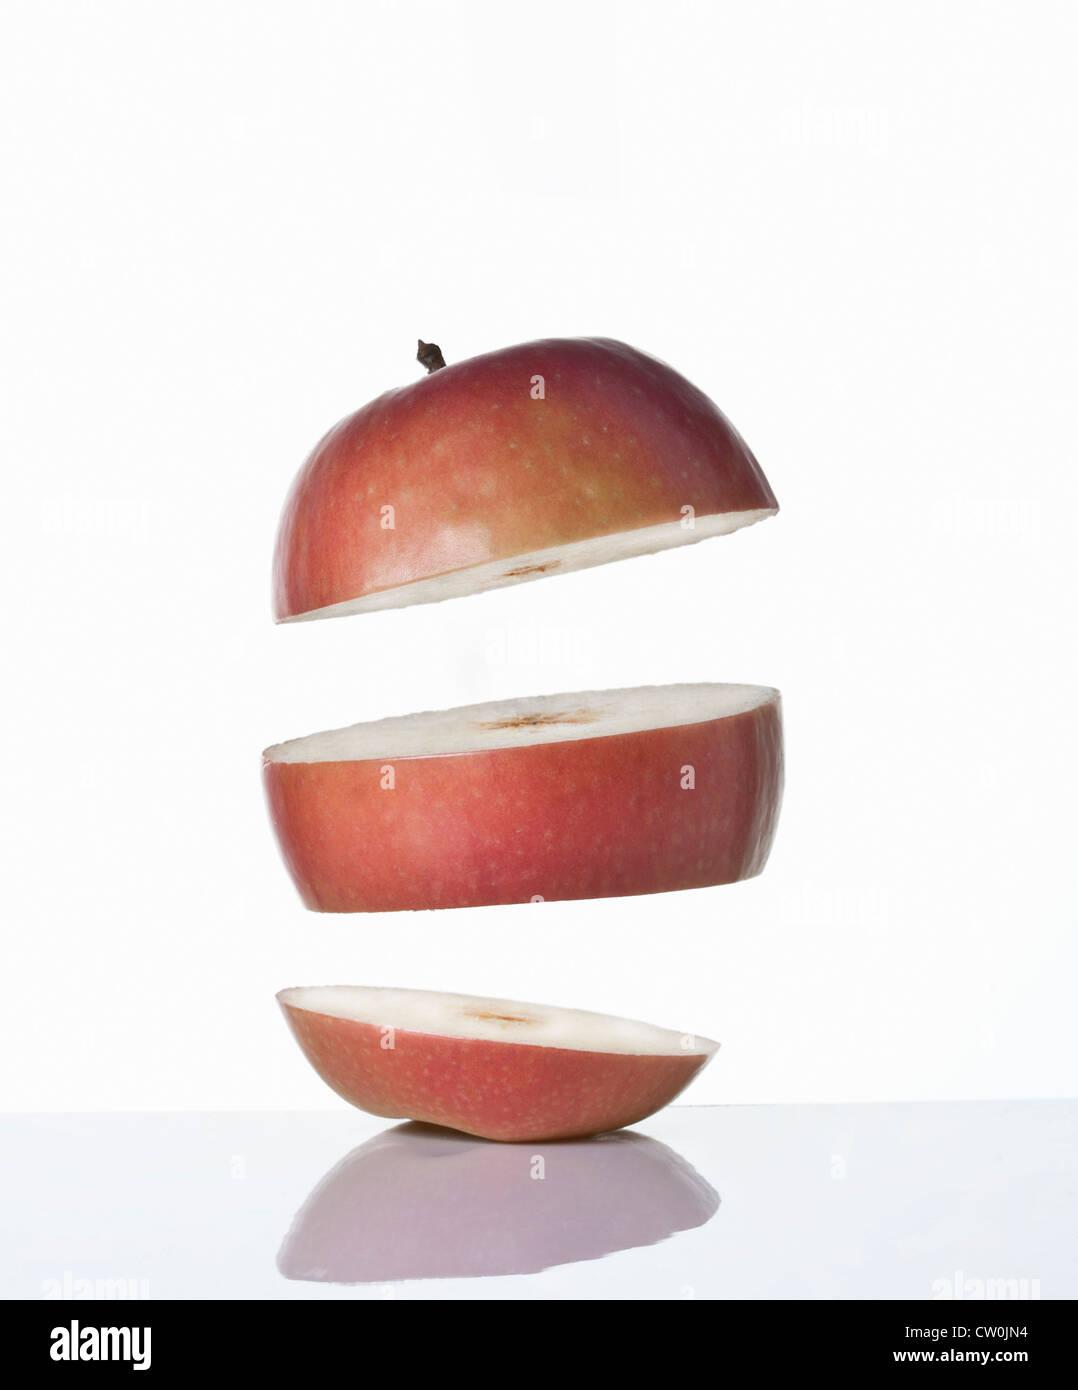 Cerca de rodajas de manzana Imagen De Stock